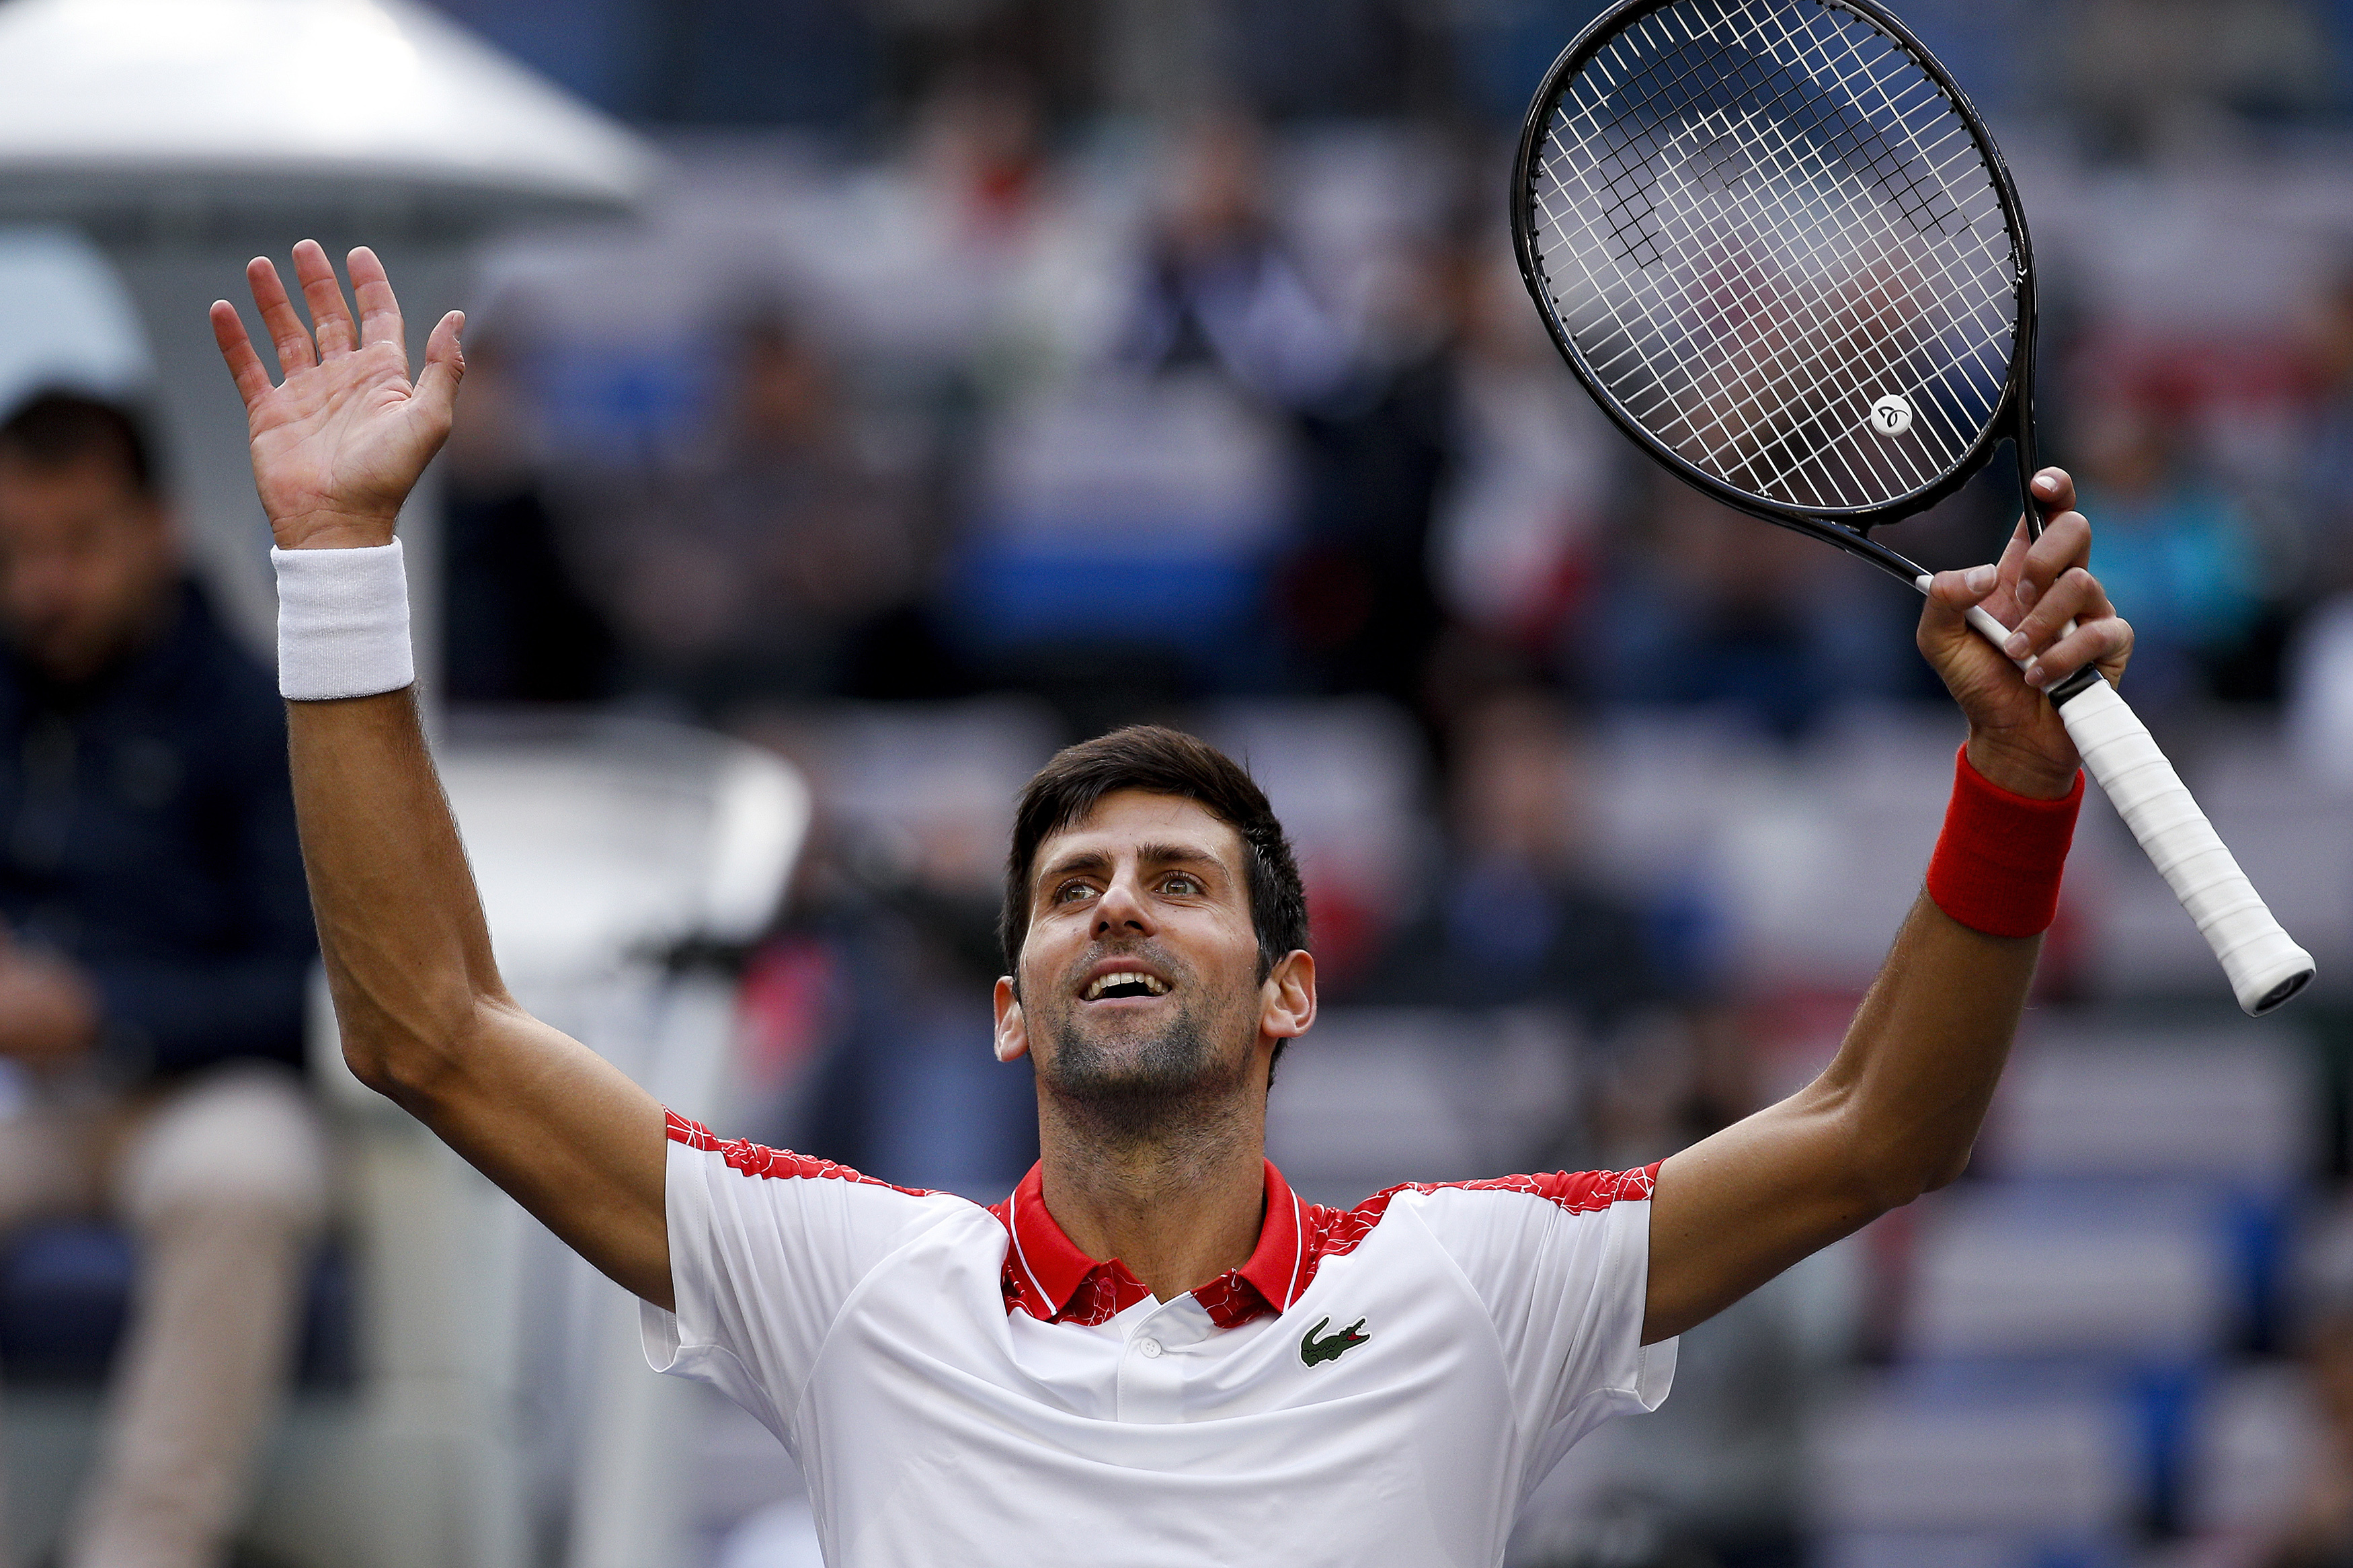 Gospodar Angaja Novak Bez Izgubljenog Seta Do Nove Masters Titule Ratu Tenis Beta Ap Sport